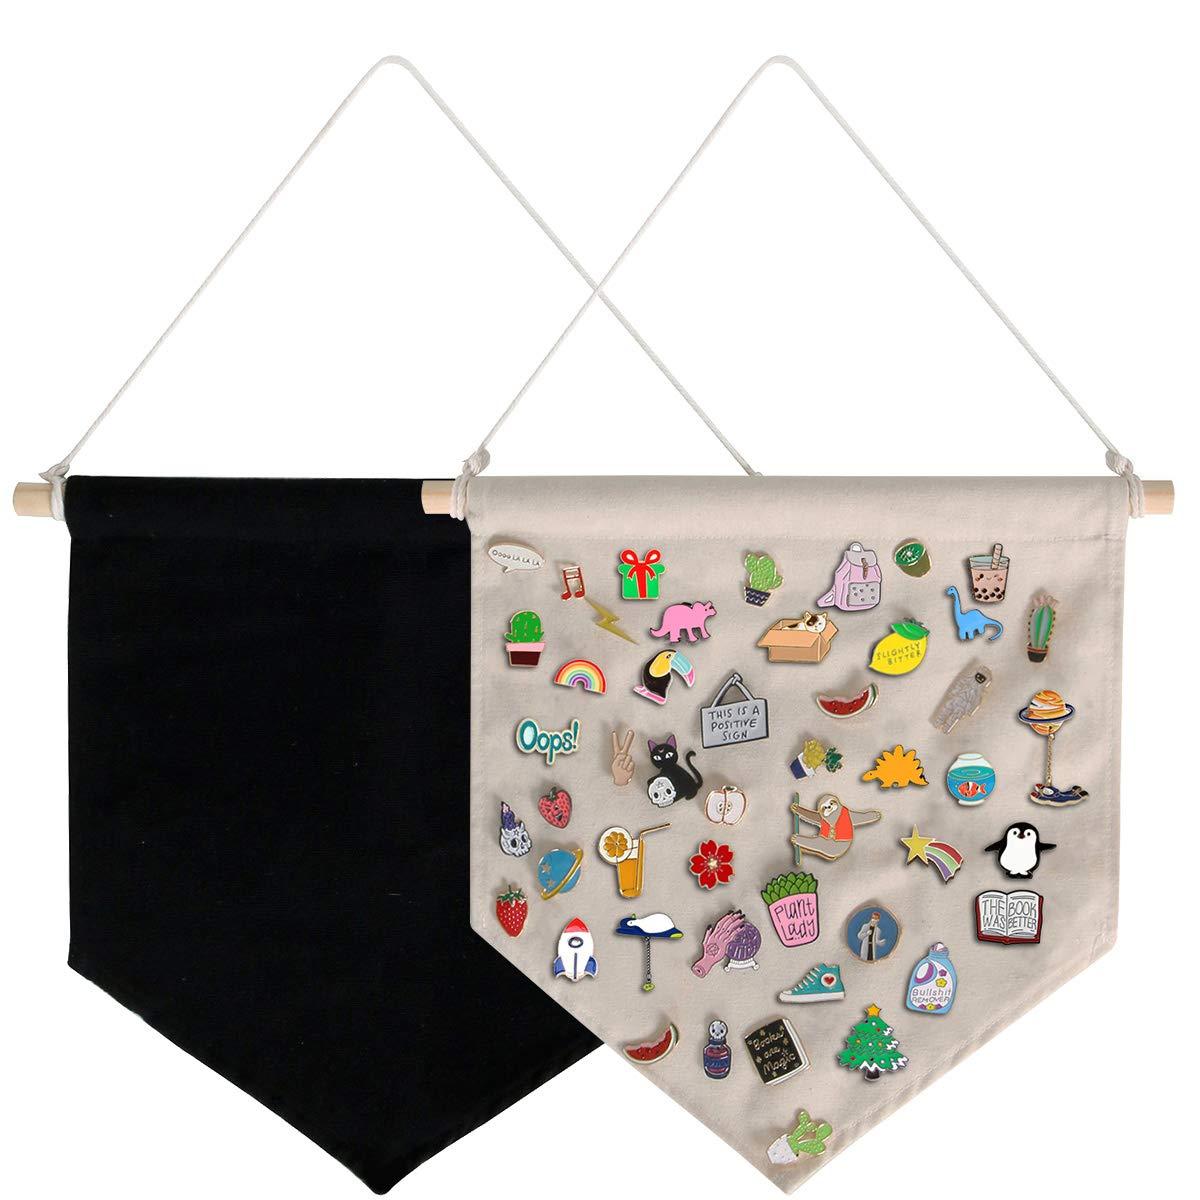 Pin Wall Display Banner Enamel Lapel Badge Flag Canvas Wall Banners 3 Colors